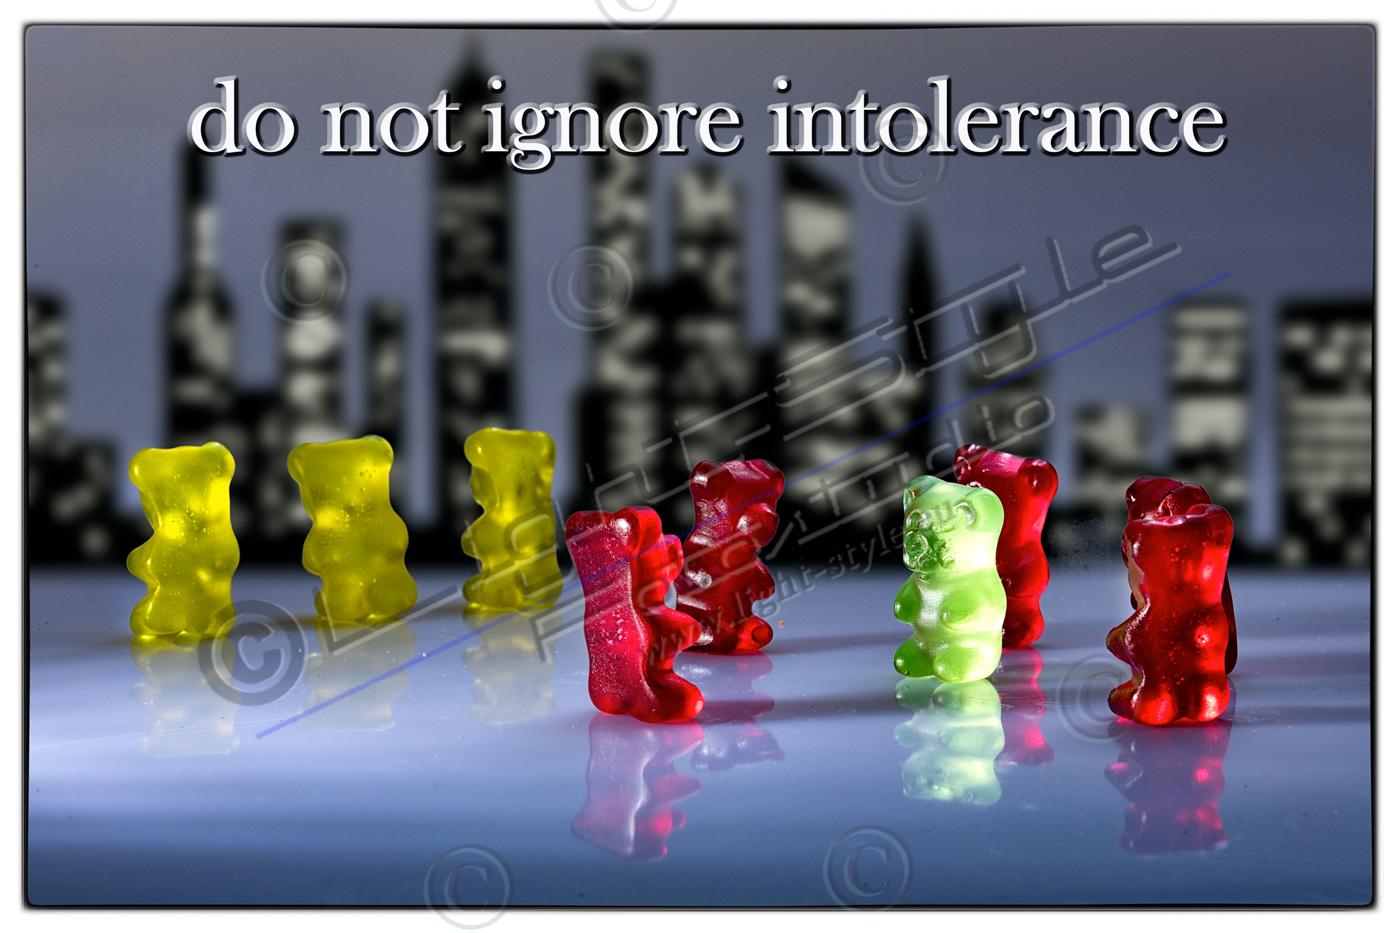 No Intolerance-1